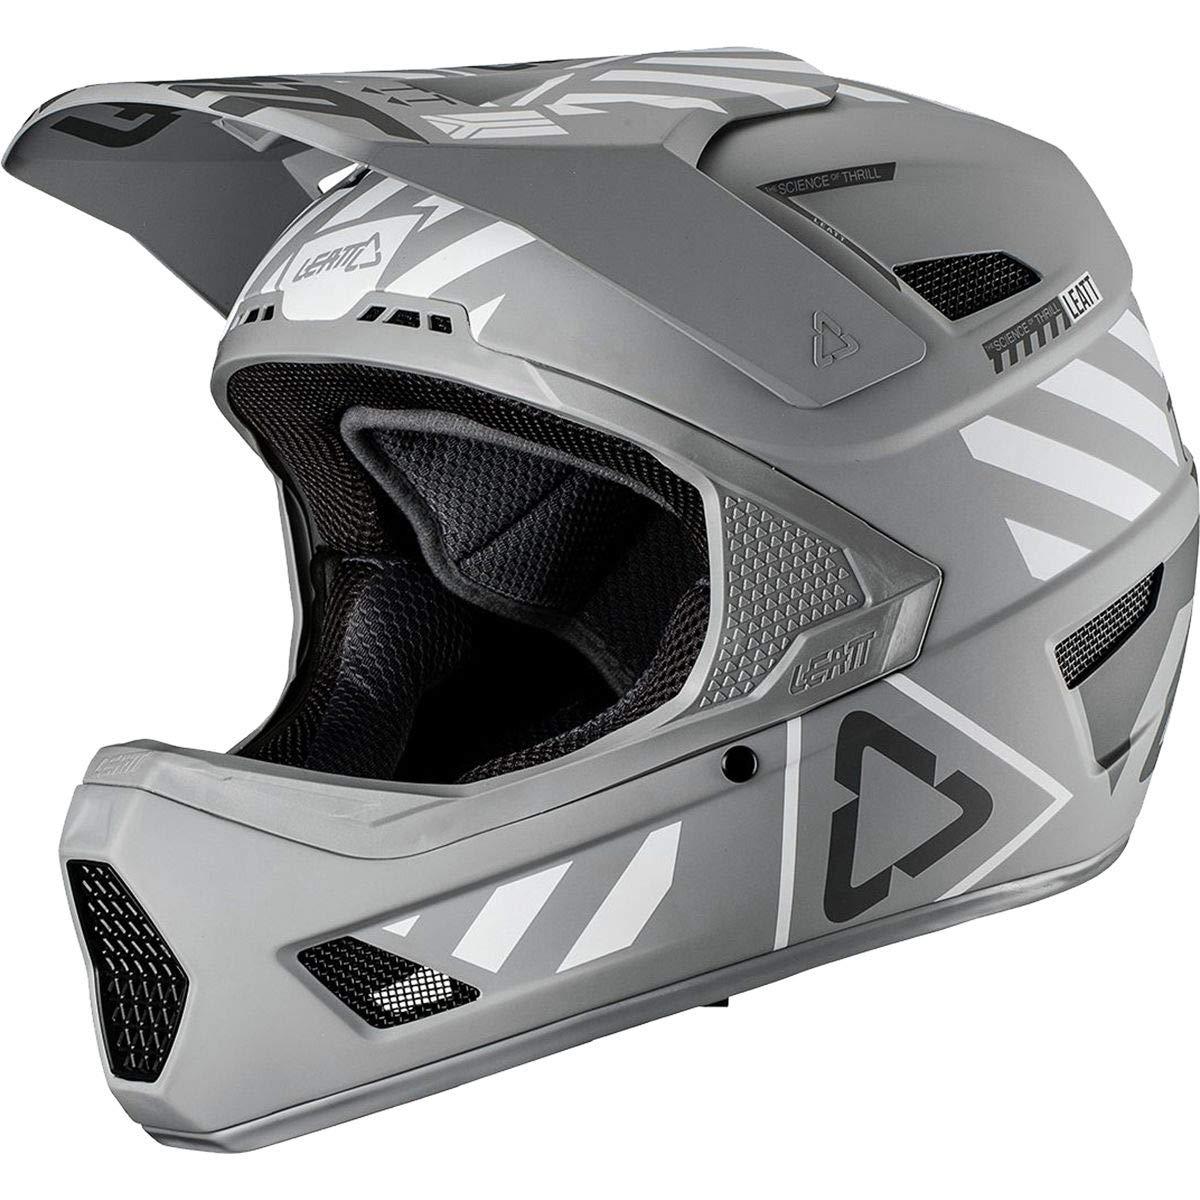 Leatt DBX 4.0 V19.3アダルトオフロードBMXサイクリングヘルメット - スチール/ラージ   B07H2R6N7B